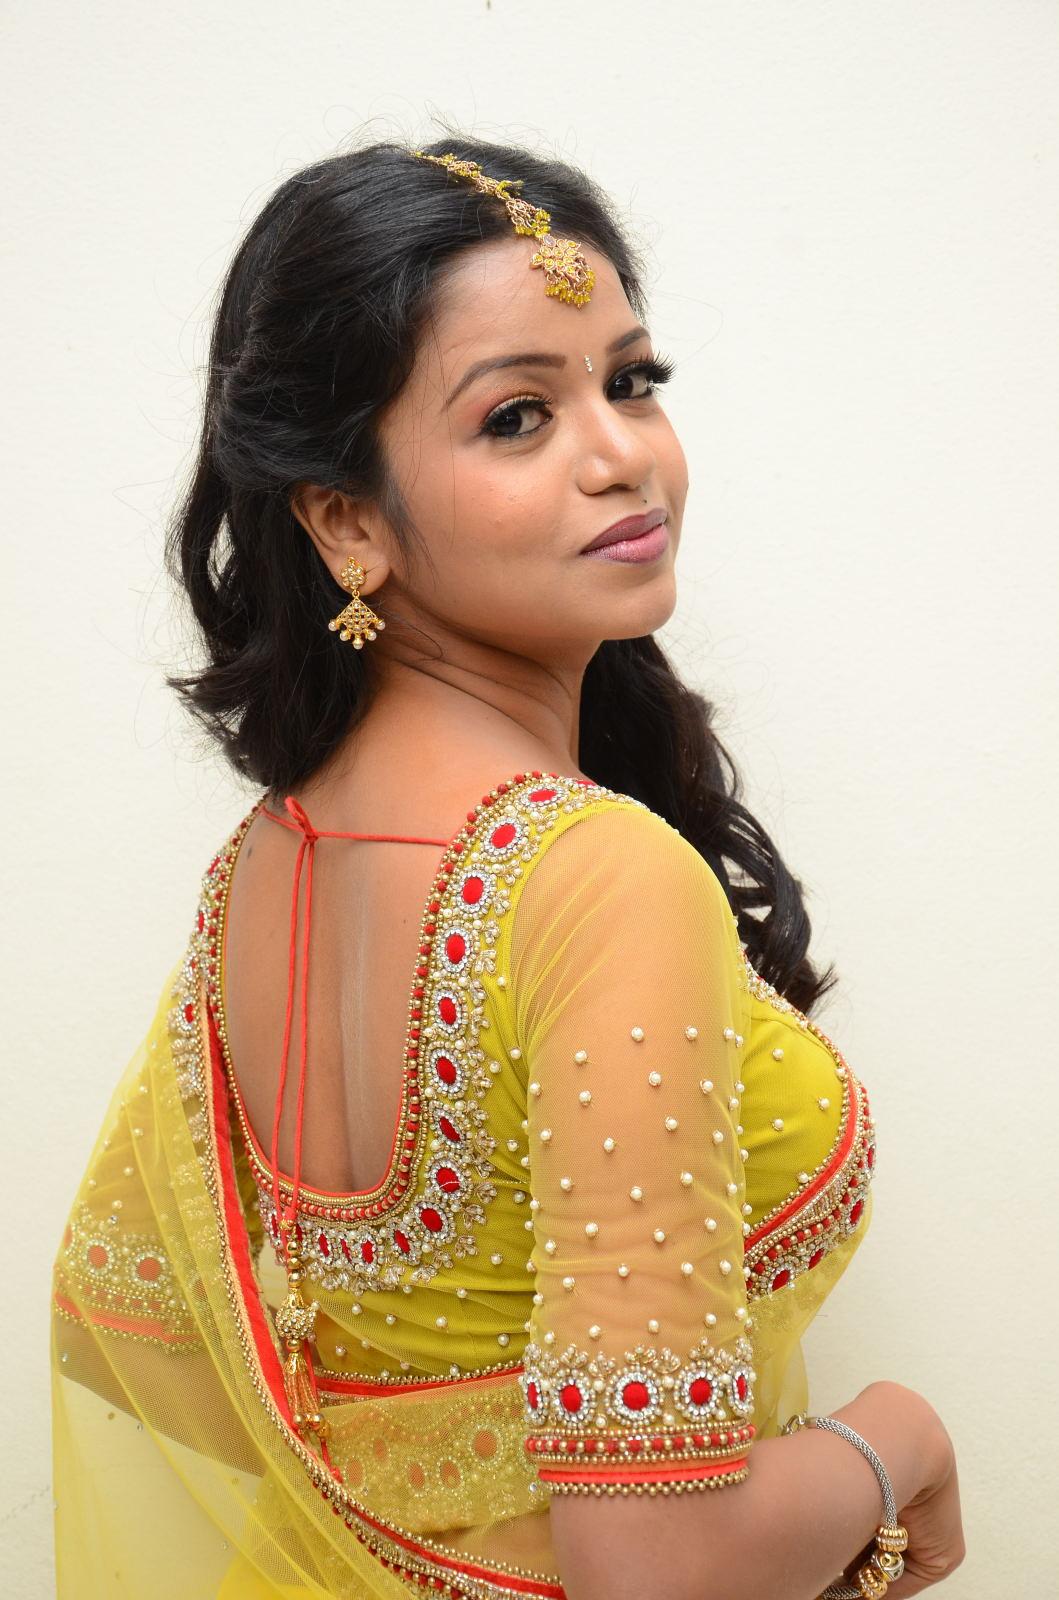 Bhavya Sri glamorous photo gallery-HQ-Photo-2